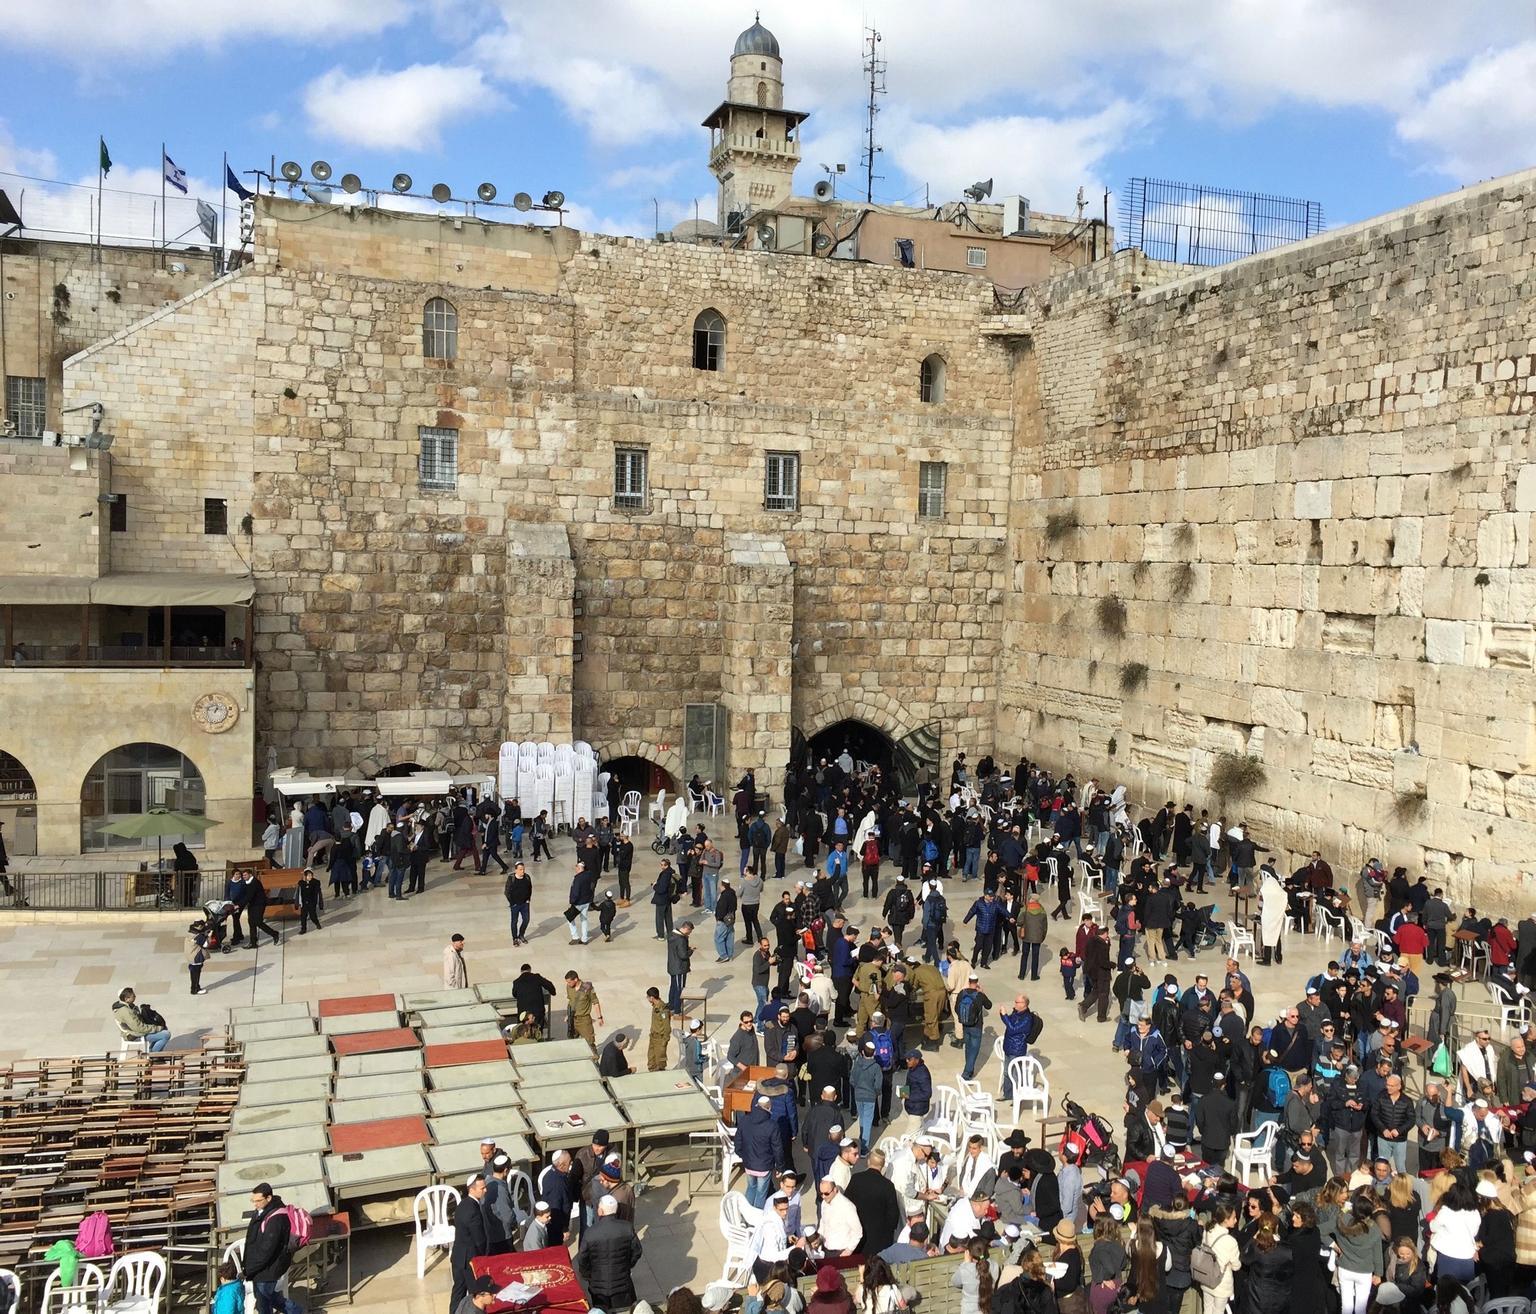 MORE PHOTOS, Jerusalem Three Religions Holy City Walking Tour